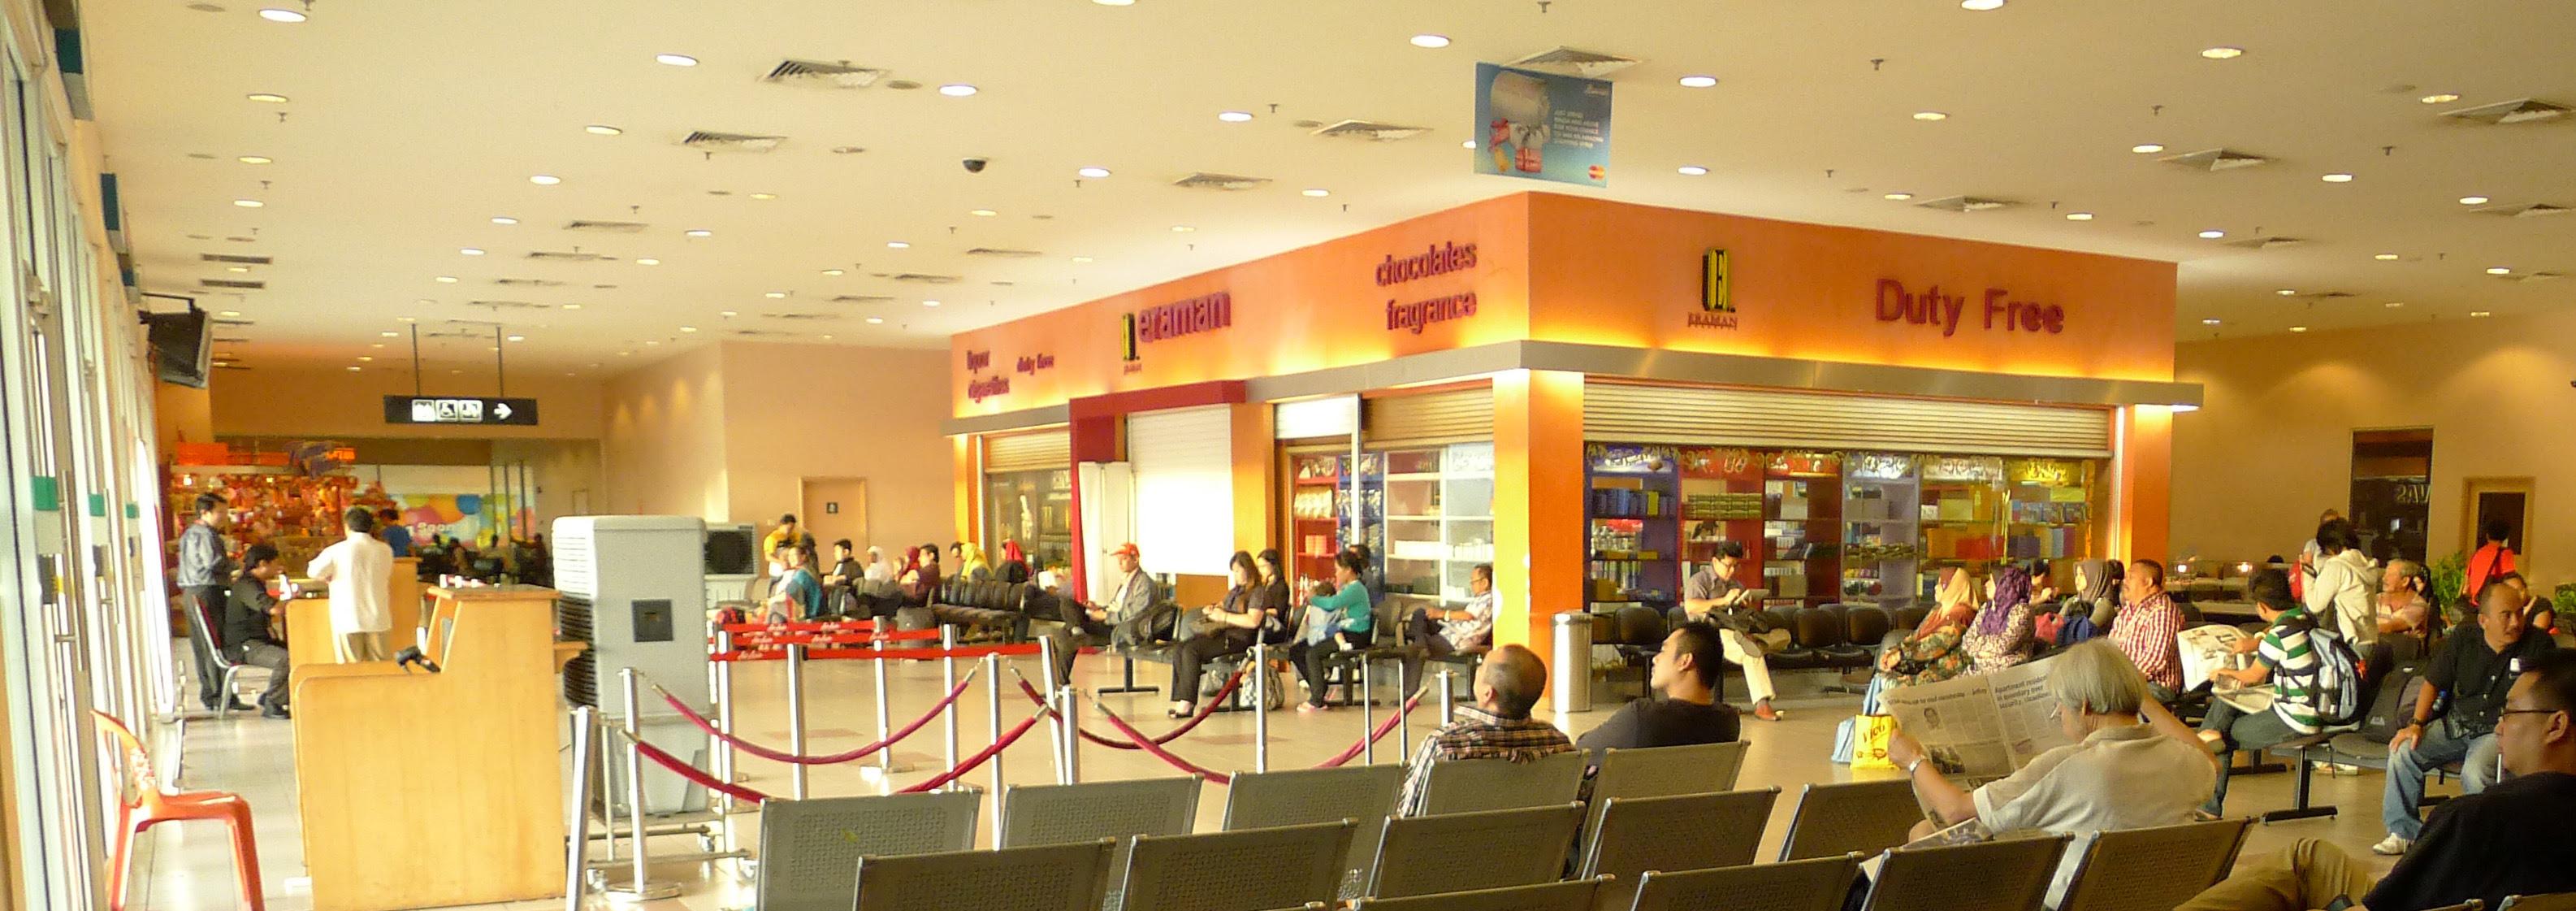 Kota Kinabalu International Airport Food